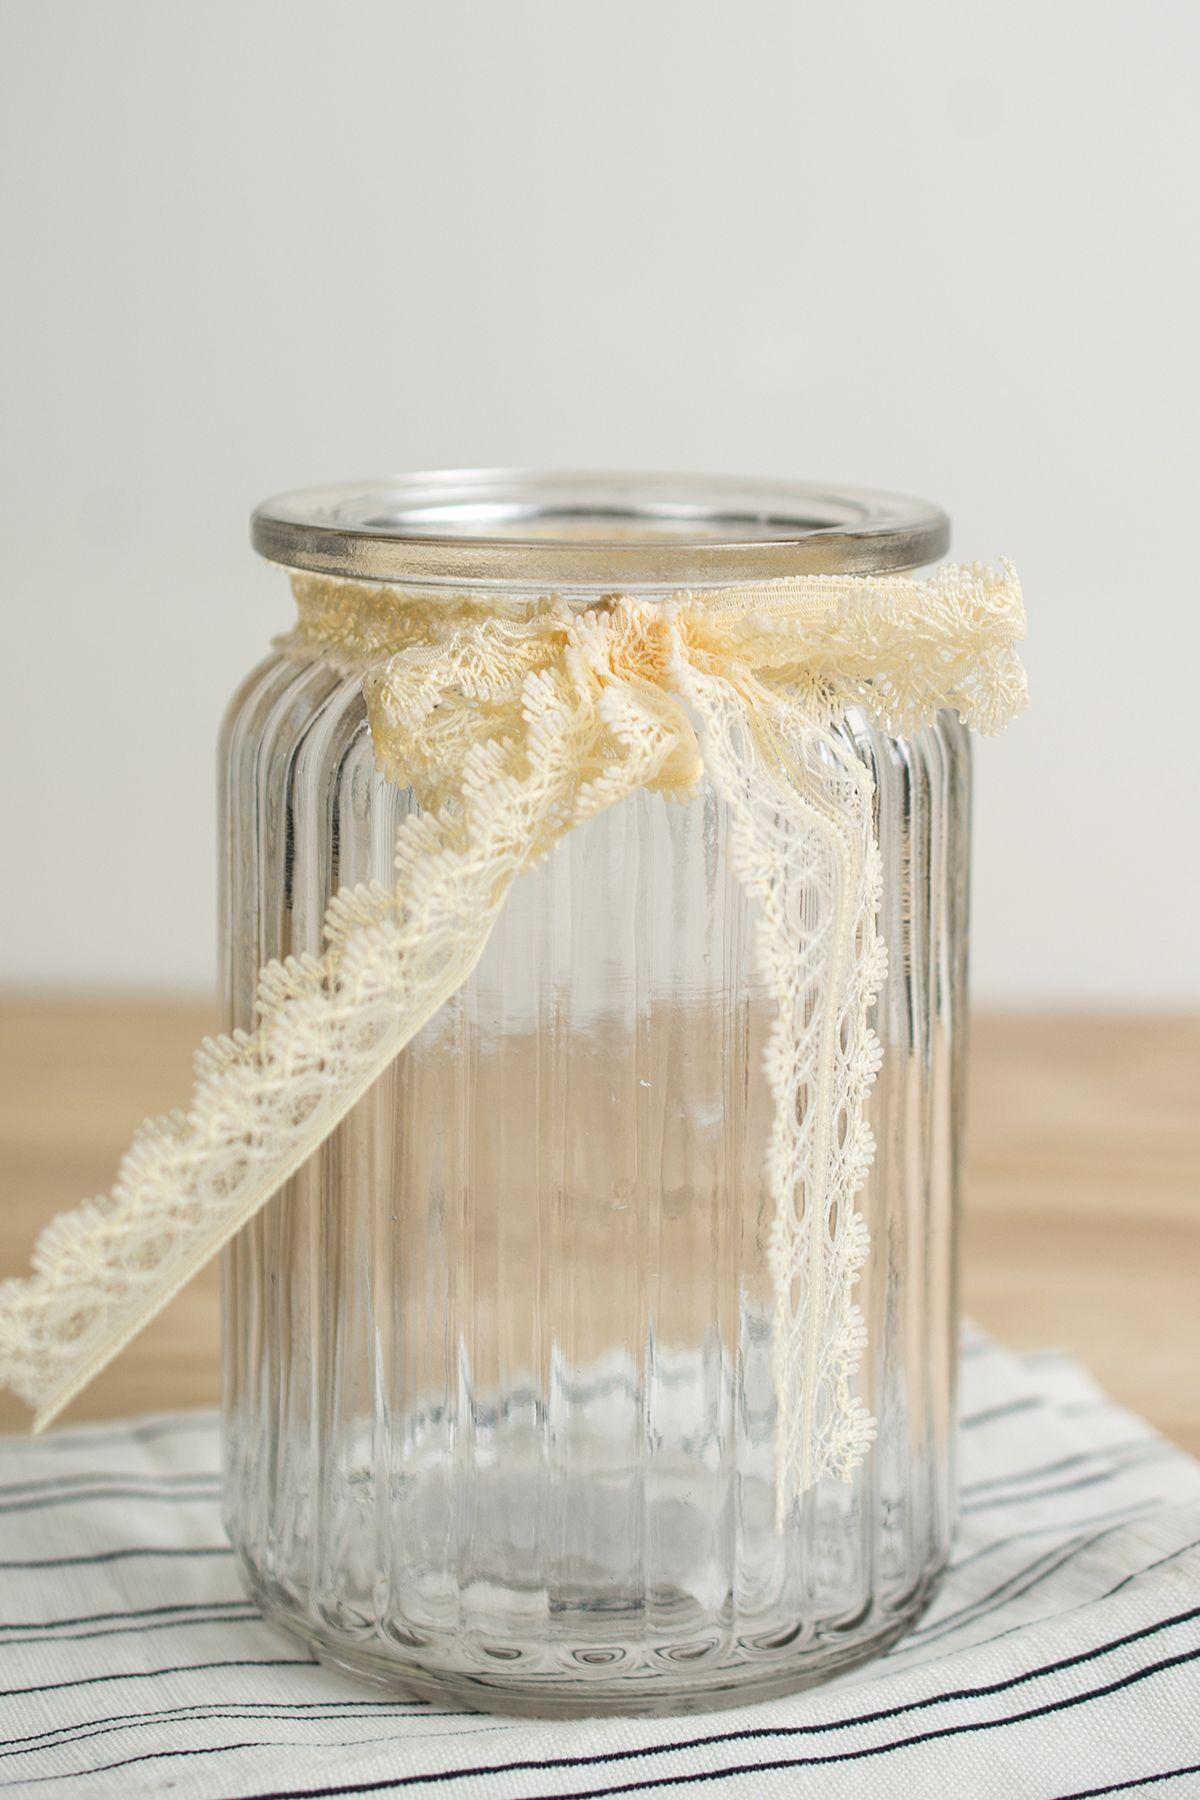 Lattice glass jar vase 55in ivory lace bow ivory place setting lattice glass jar vase 55in ivory lace bow floridaeventfo Images